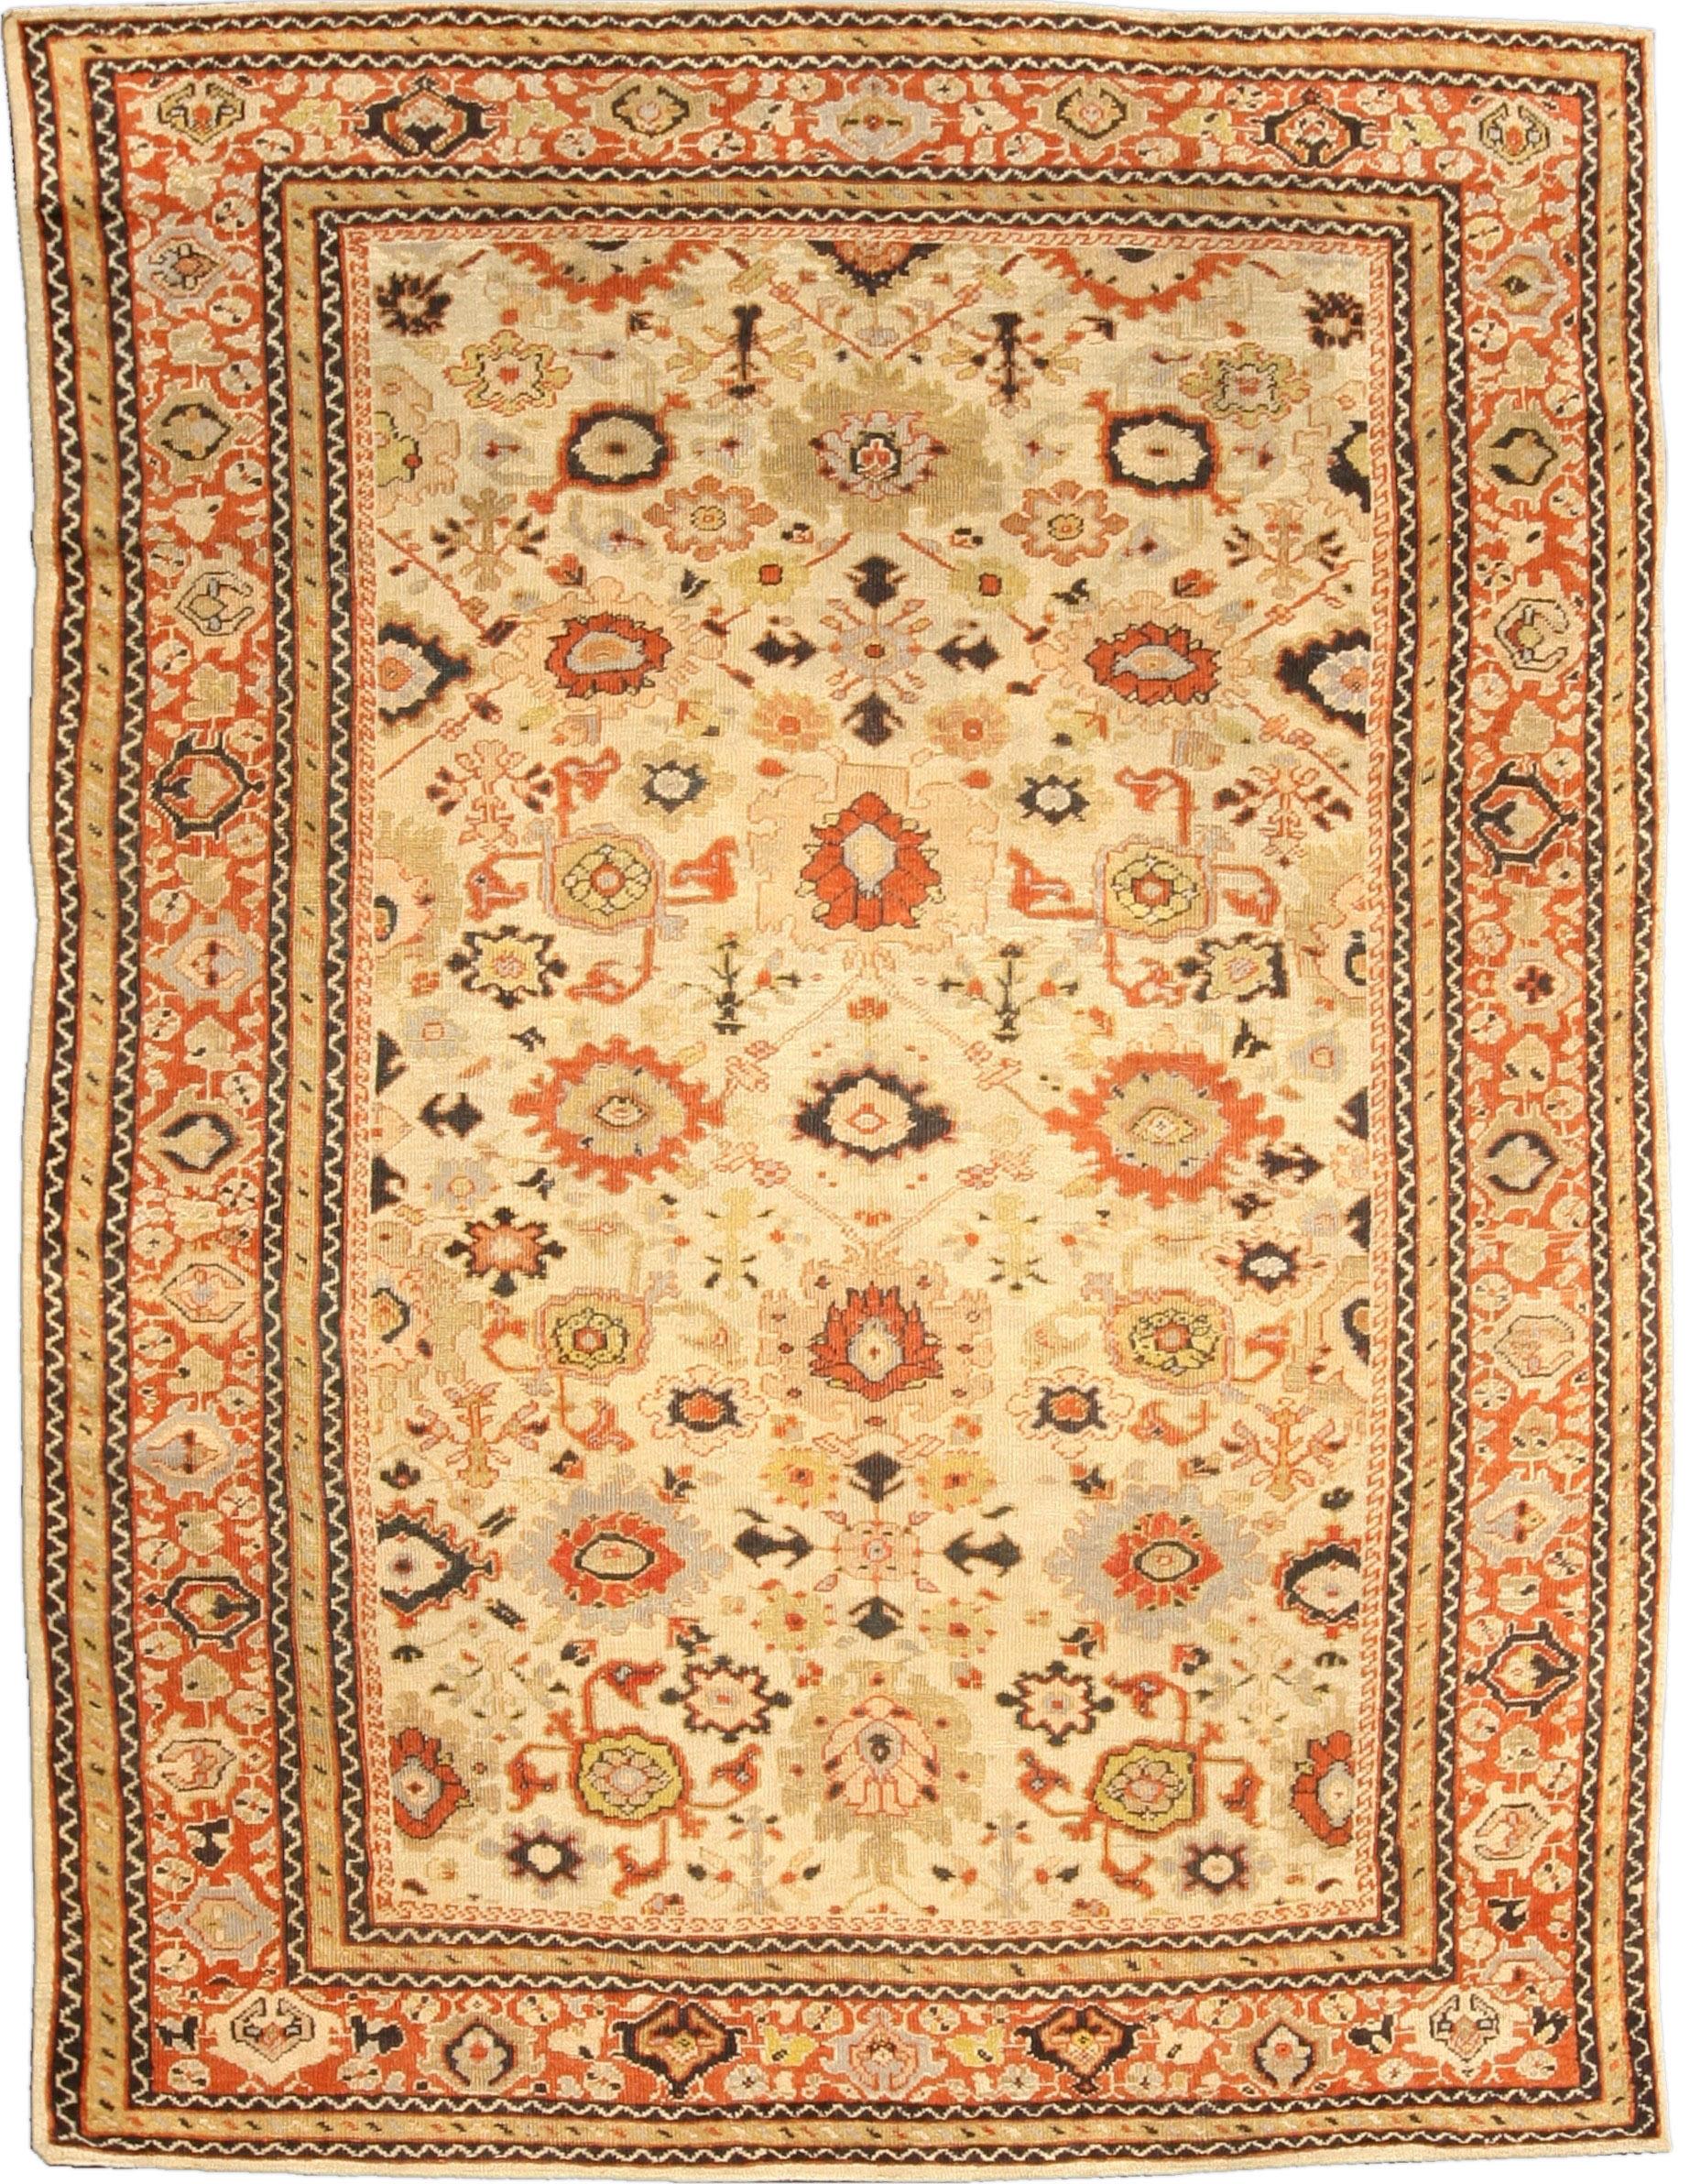 Sultanabad Rug Antique Persian Rug Antique Rug